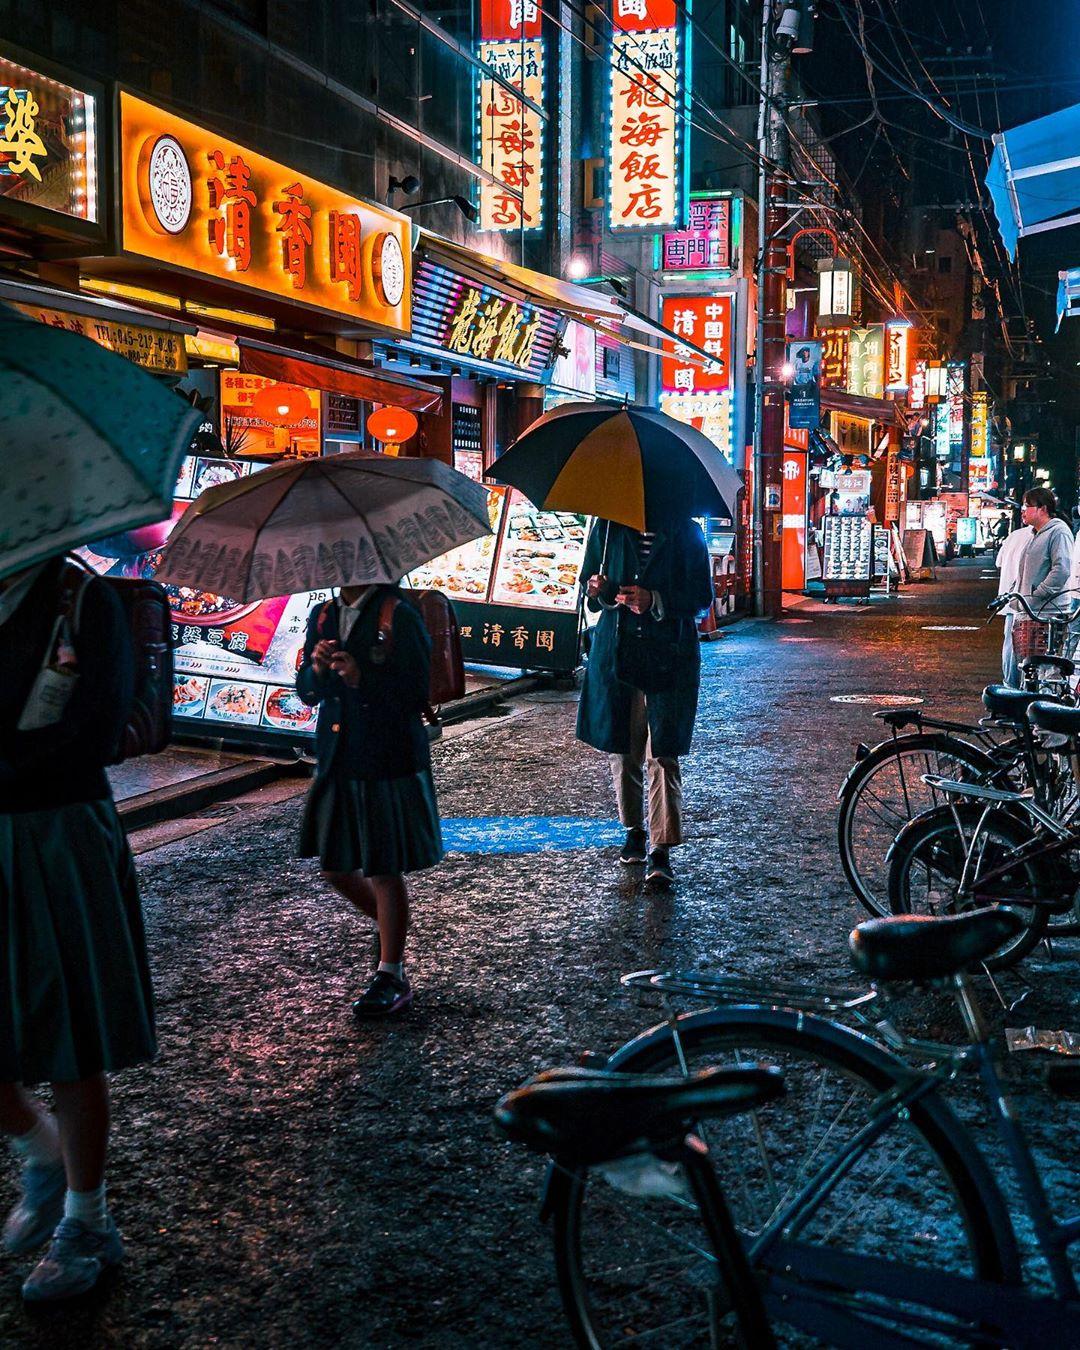 tokyo-nightlife-photography-hosokawa-ryohei-15